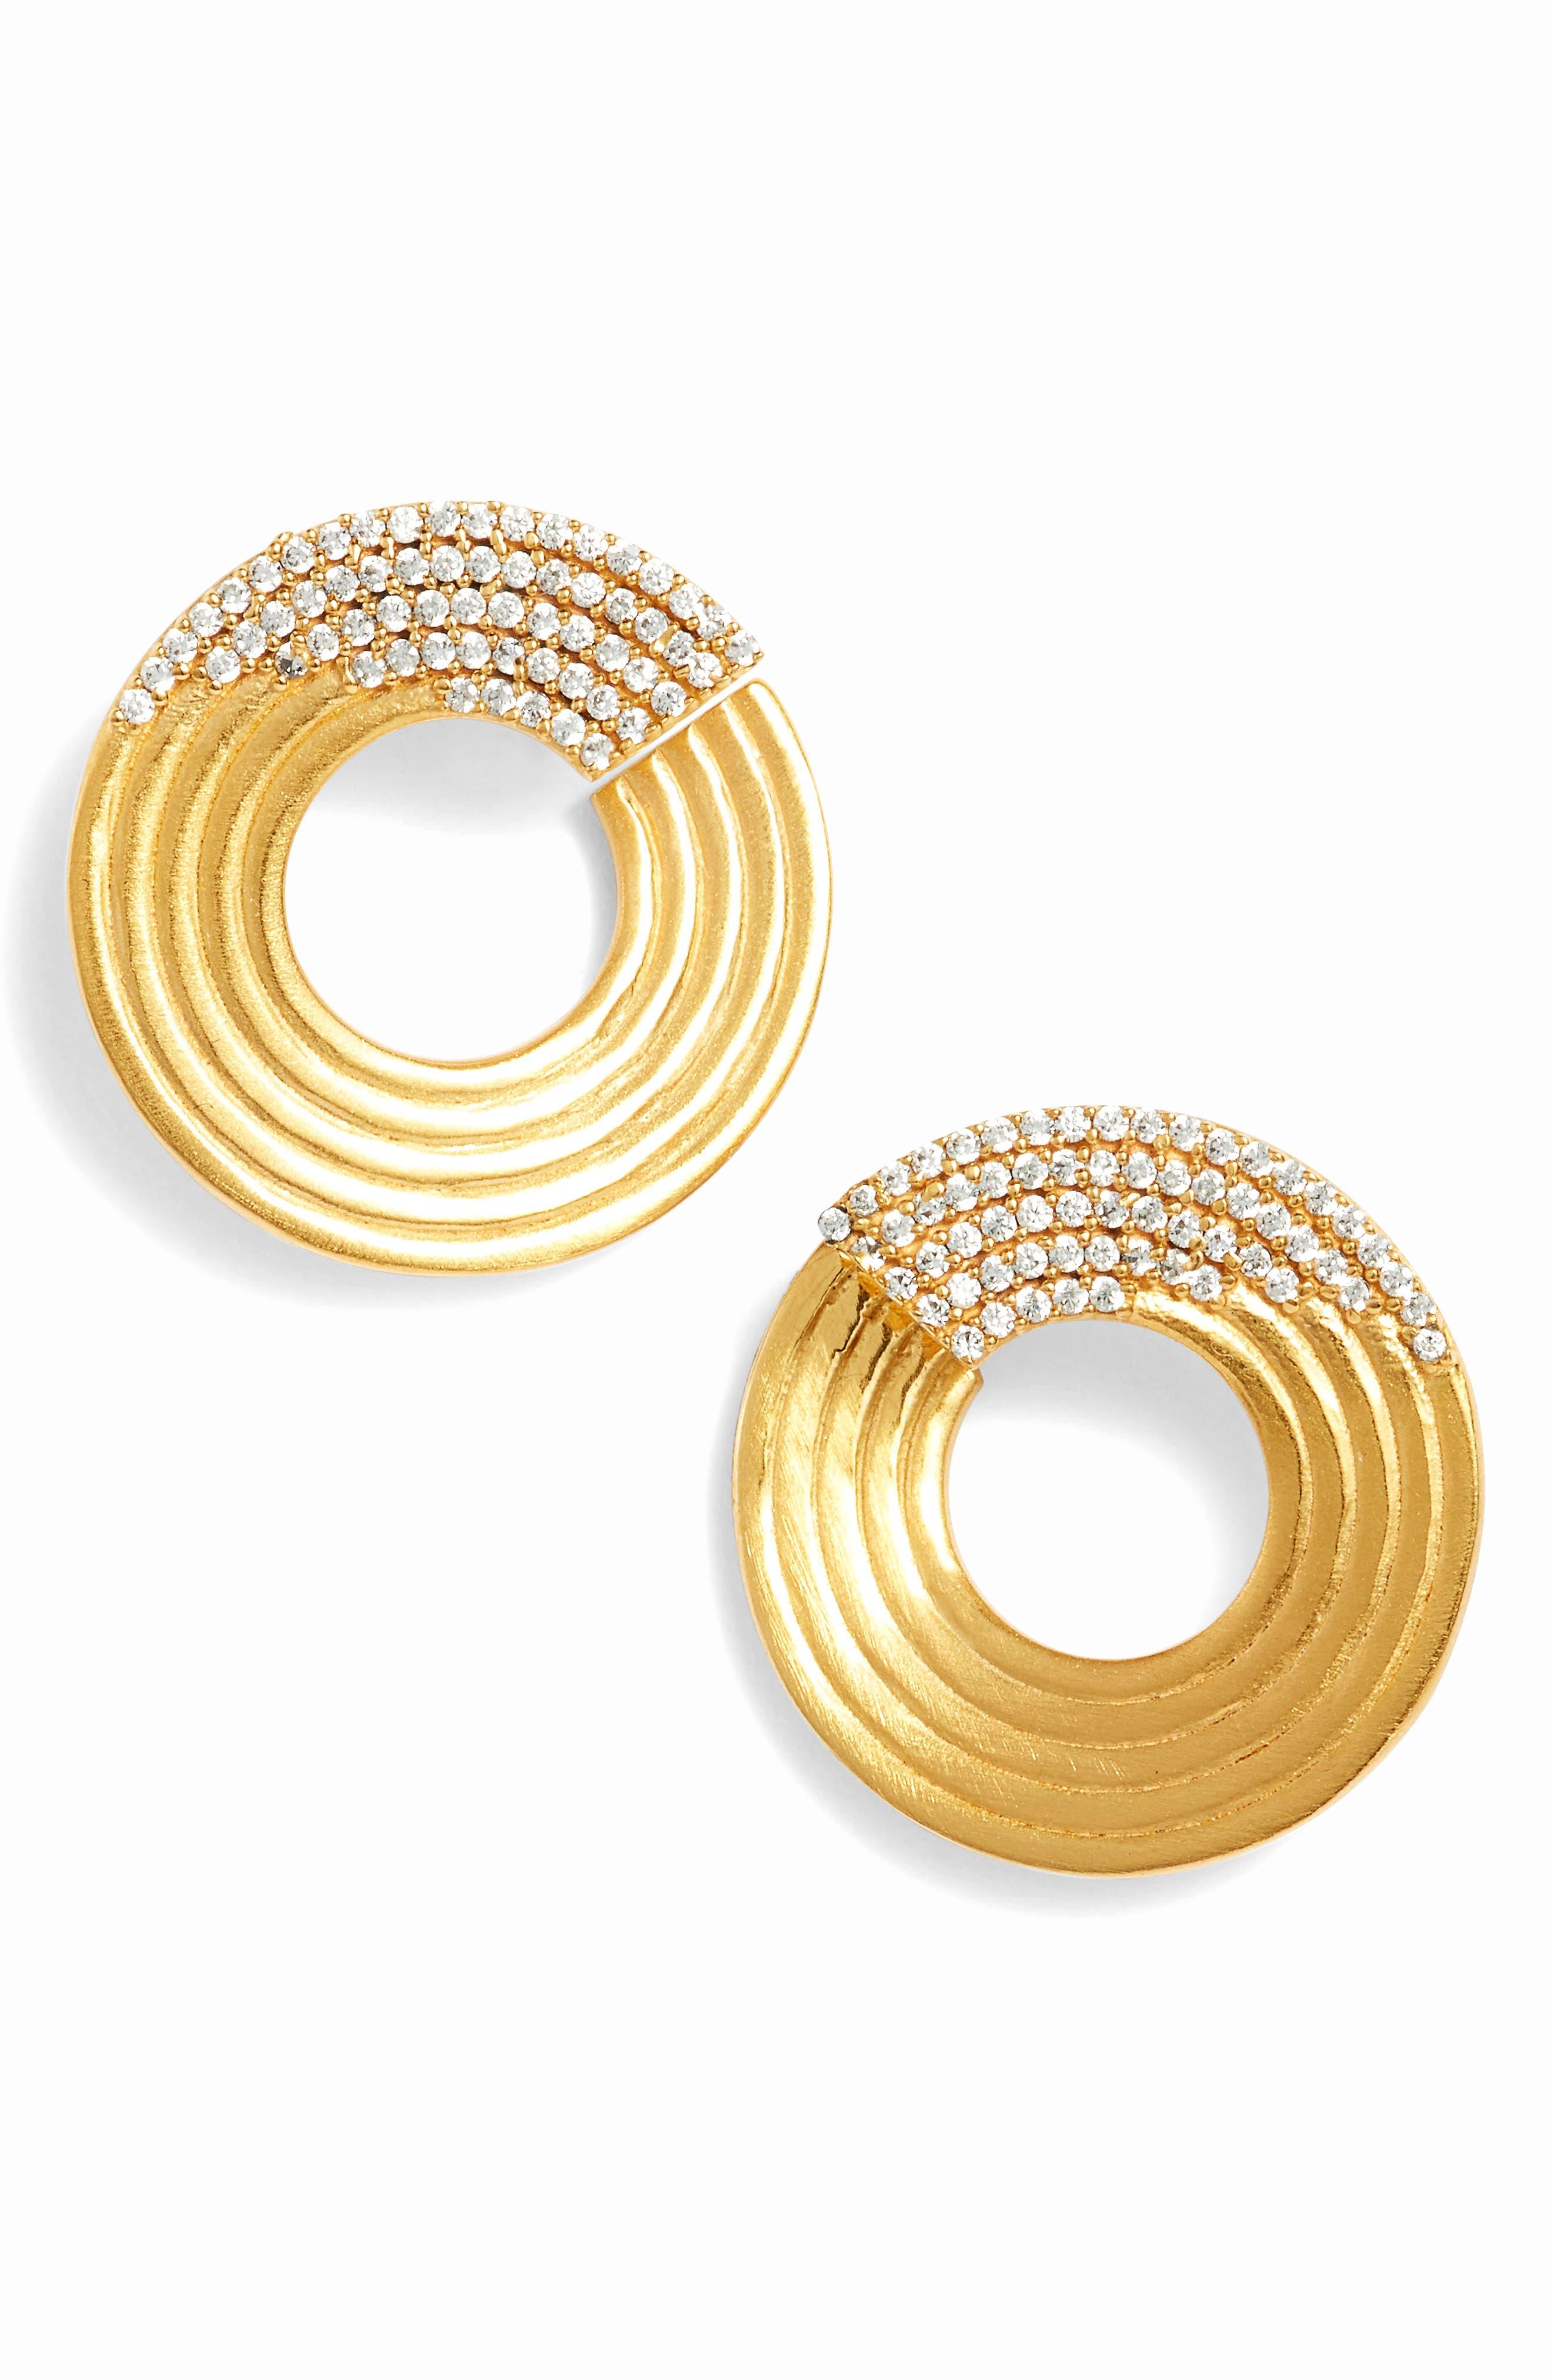 Zaha Stud Earrings,                             Main thumbnail 1, color,                             White Topaz/ Gold